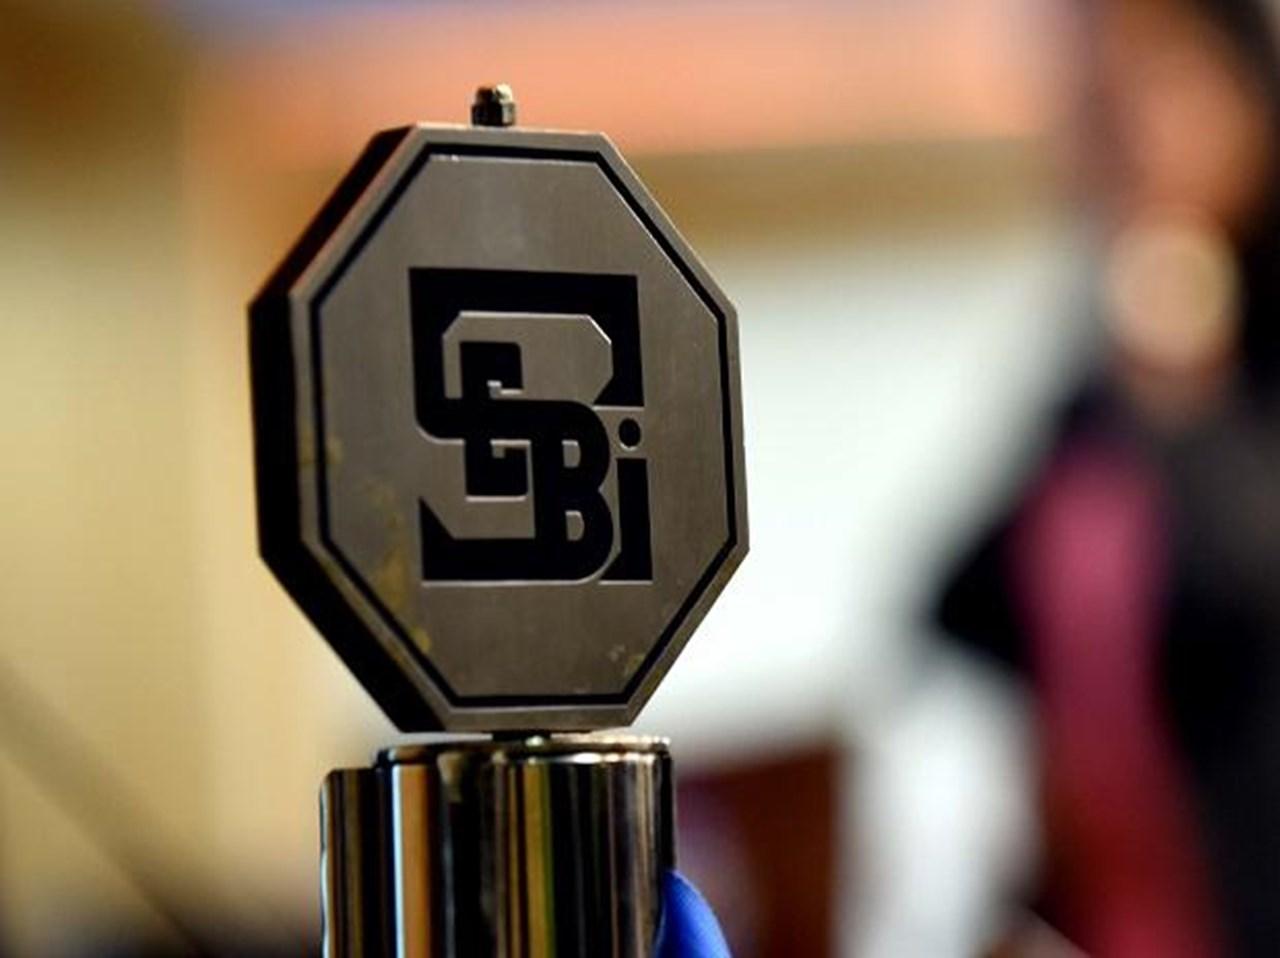 Sebi extends trading hours in commodity derivatives segment